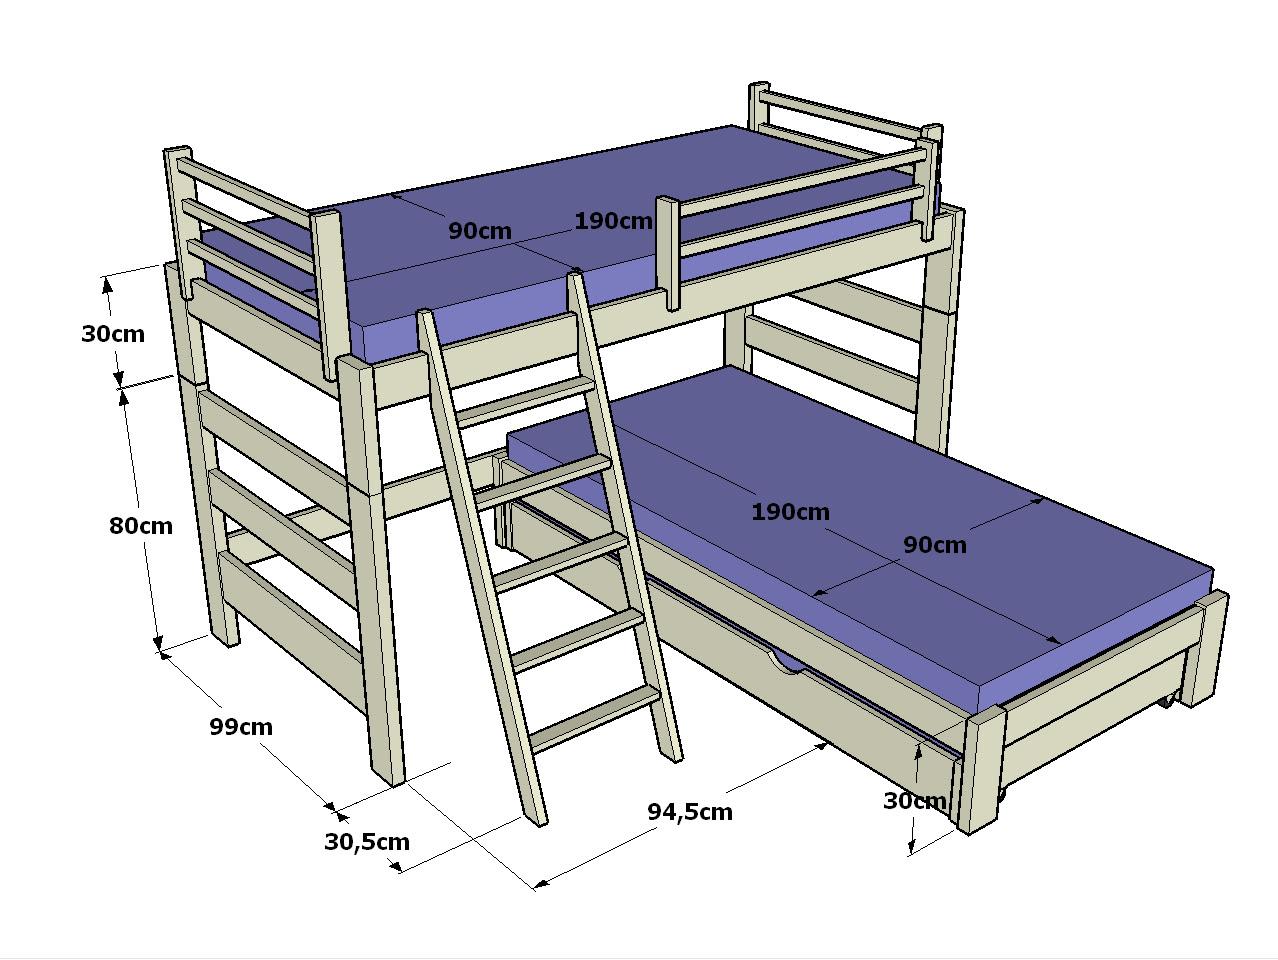 Dormitorio muebles modernos medidas litera - Medidas camas infantiles ...